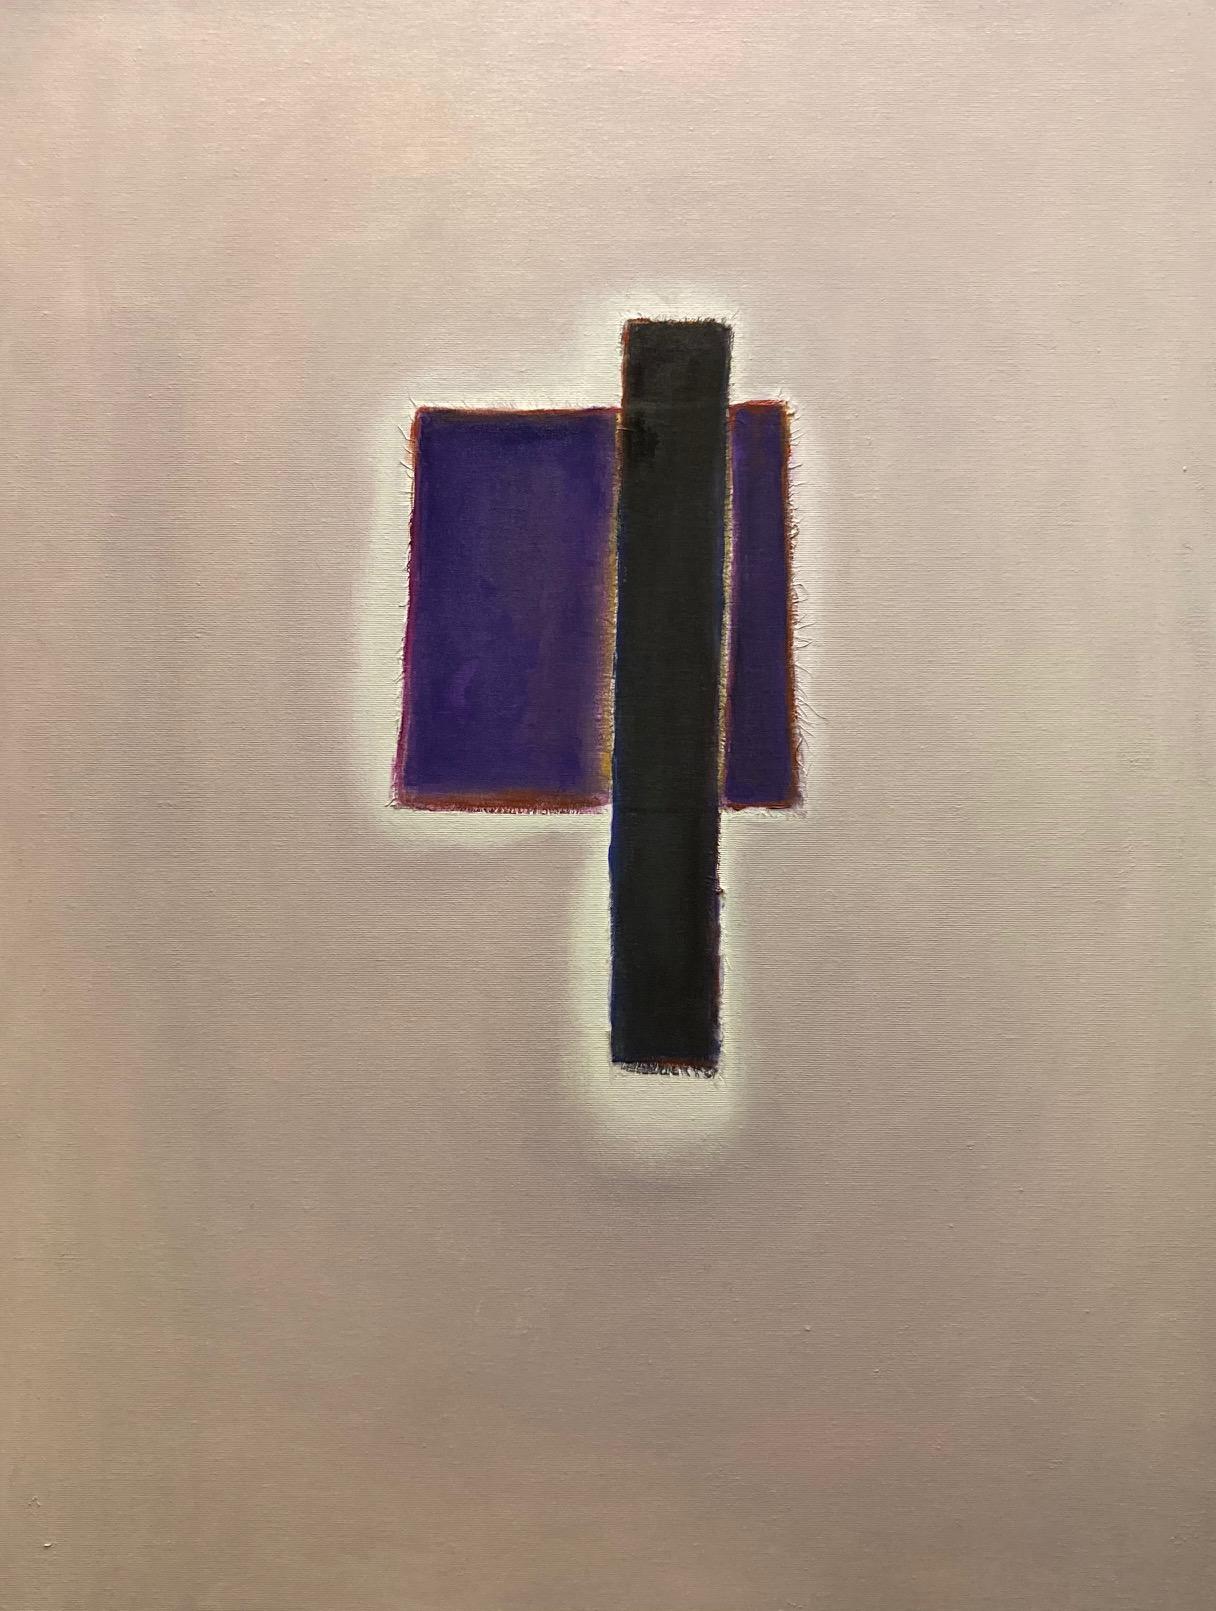 Silent Sign (5), Öl auf Leinwand, 80 x 60 cm, 2020